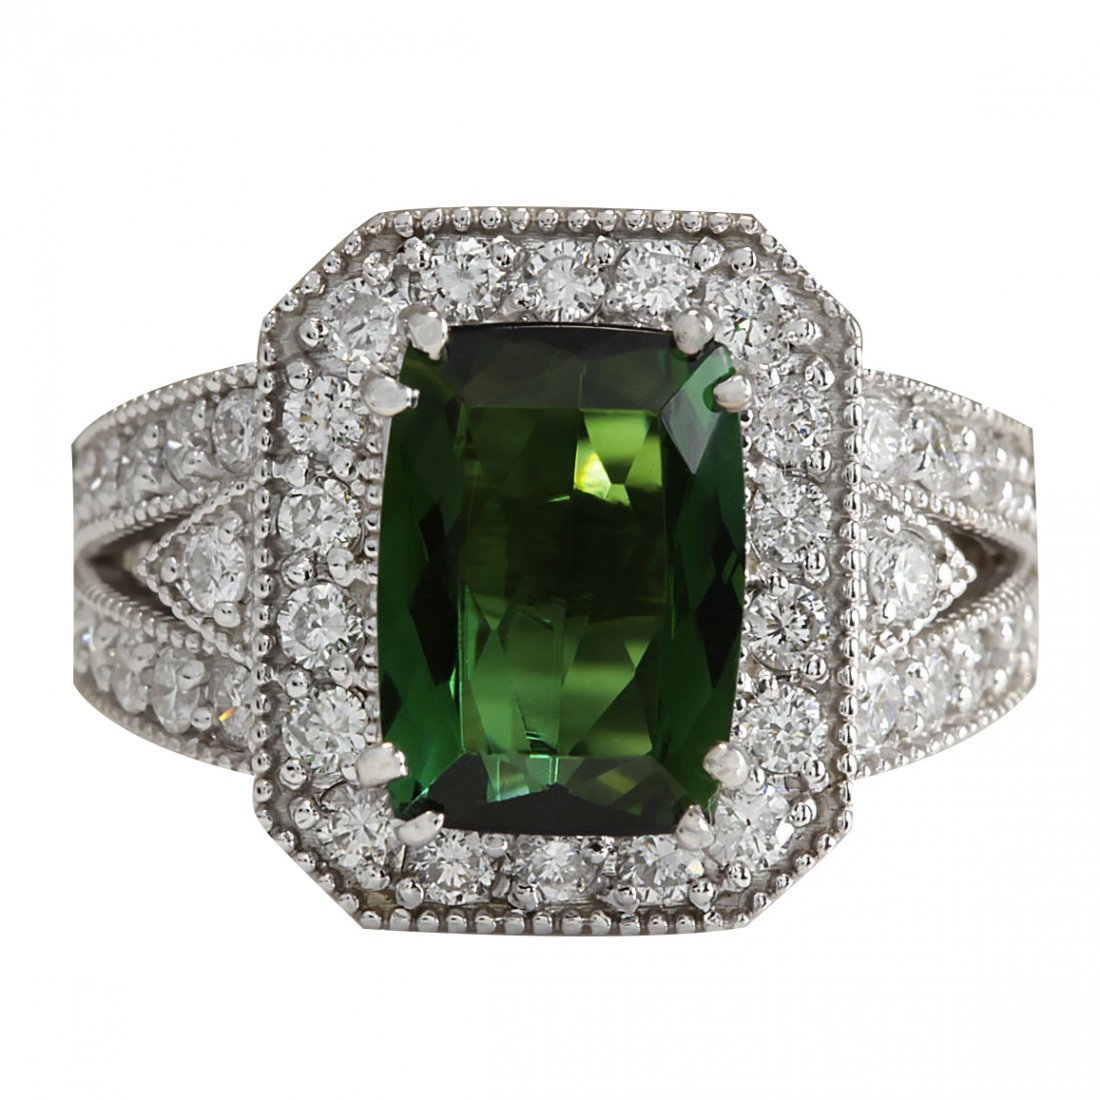 4.72CTW Natural Green Tourmaline And Diamond Ring 14K